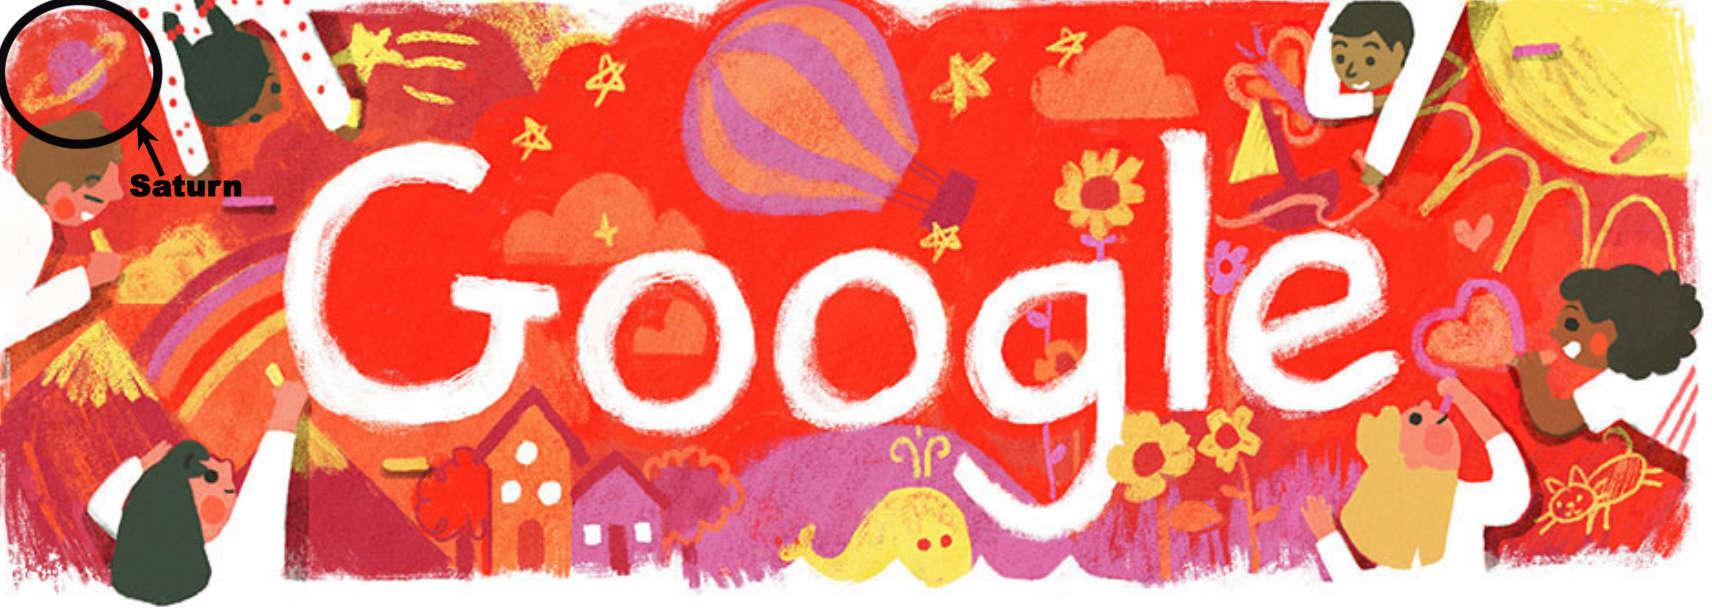 Google Doodle Symbolik - Seite 3 Dood10